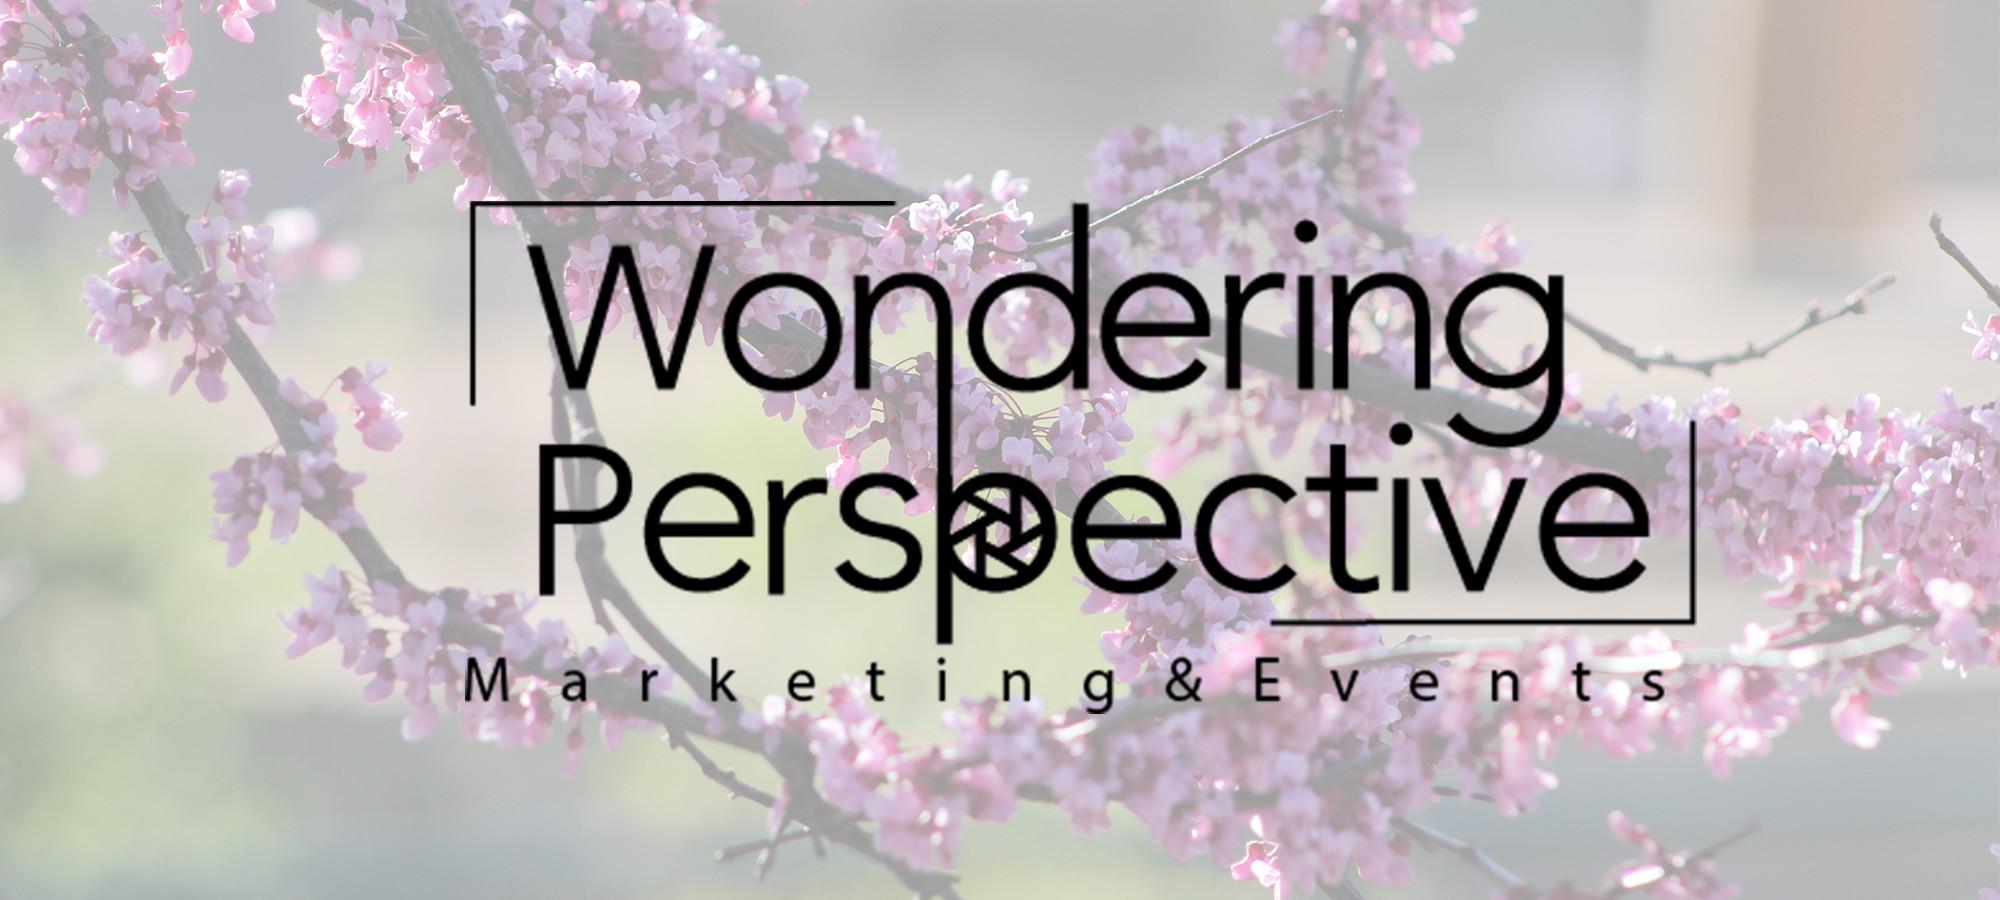 Wondering Perspective